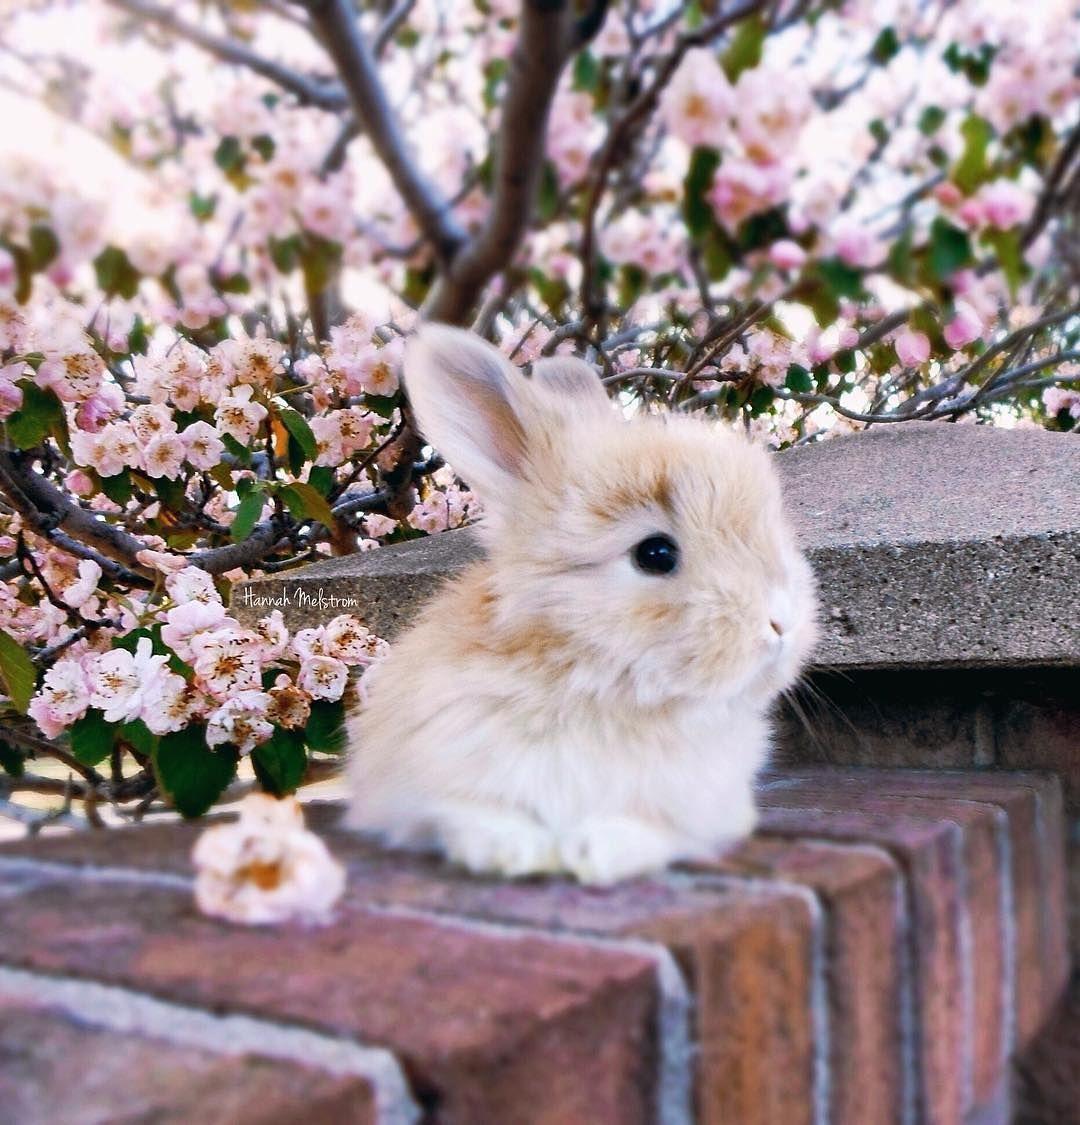 Pin by Sandy Burke on Farm Animals Rabbit, Fluffy rabbit